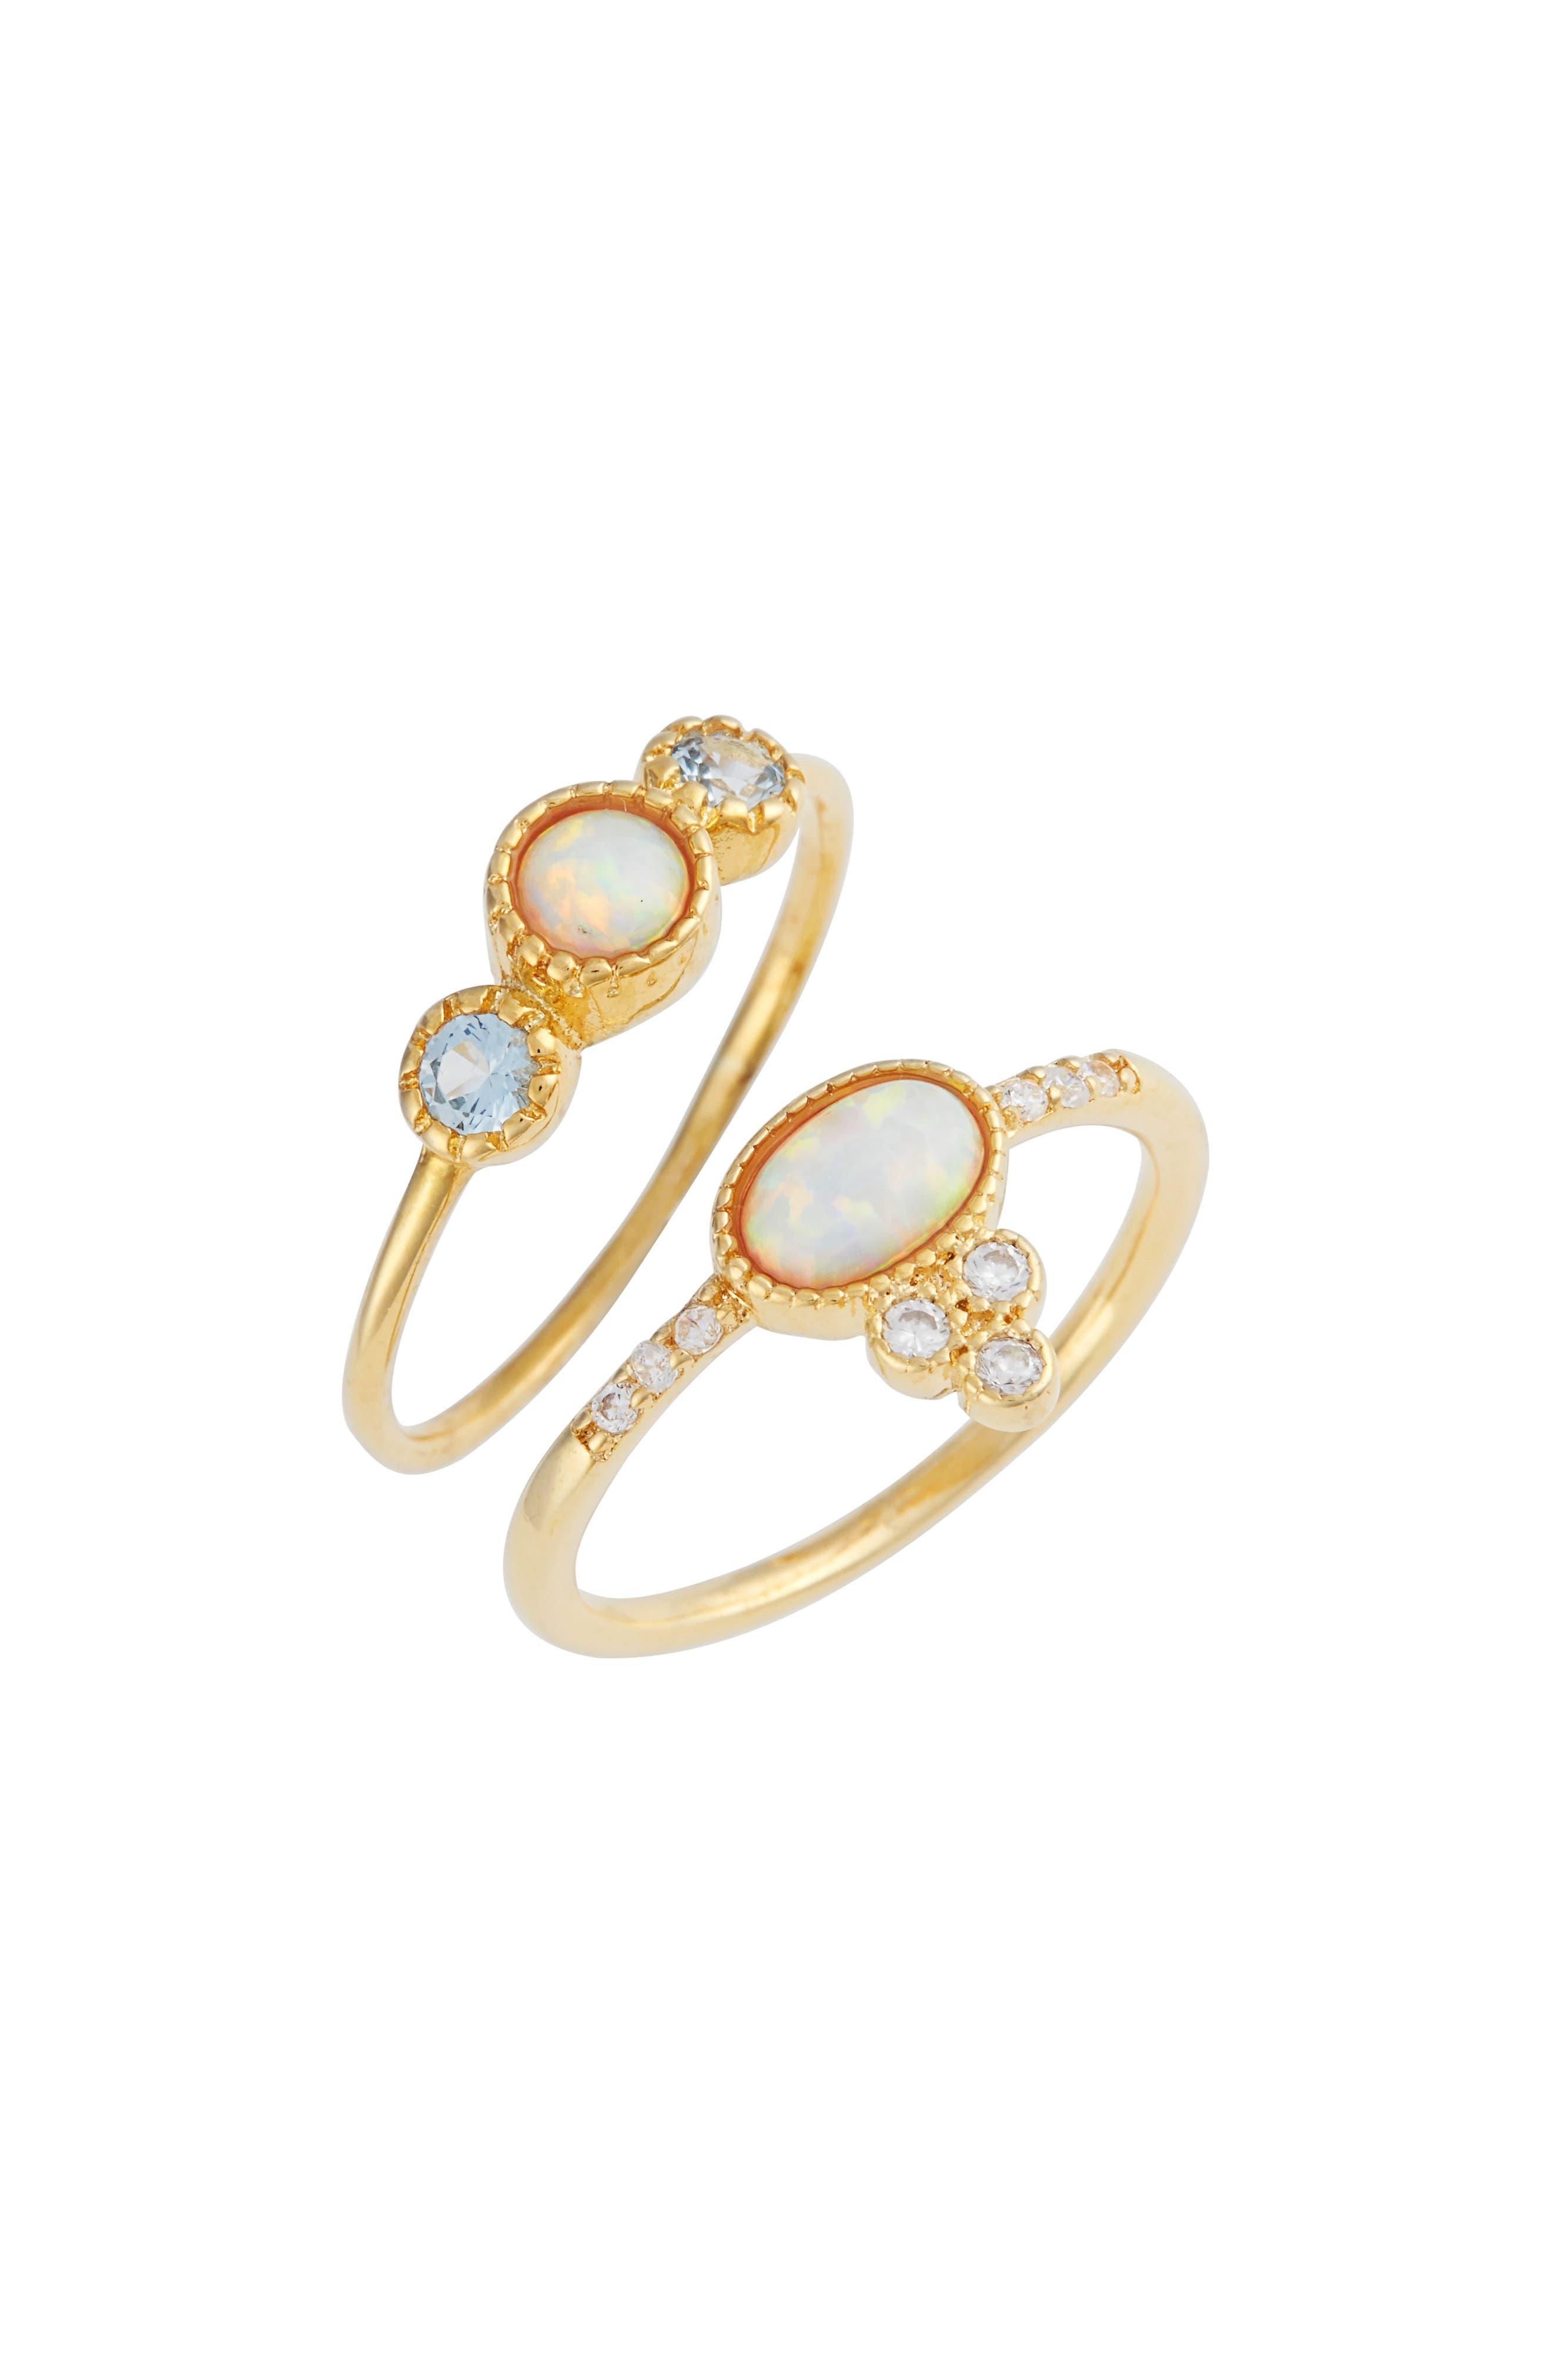 Fabiana Set of 2 Fire Opal & Crystal Rings,                             Main thumbnail 1, color,